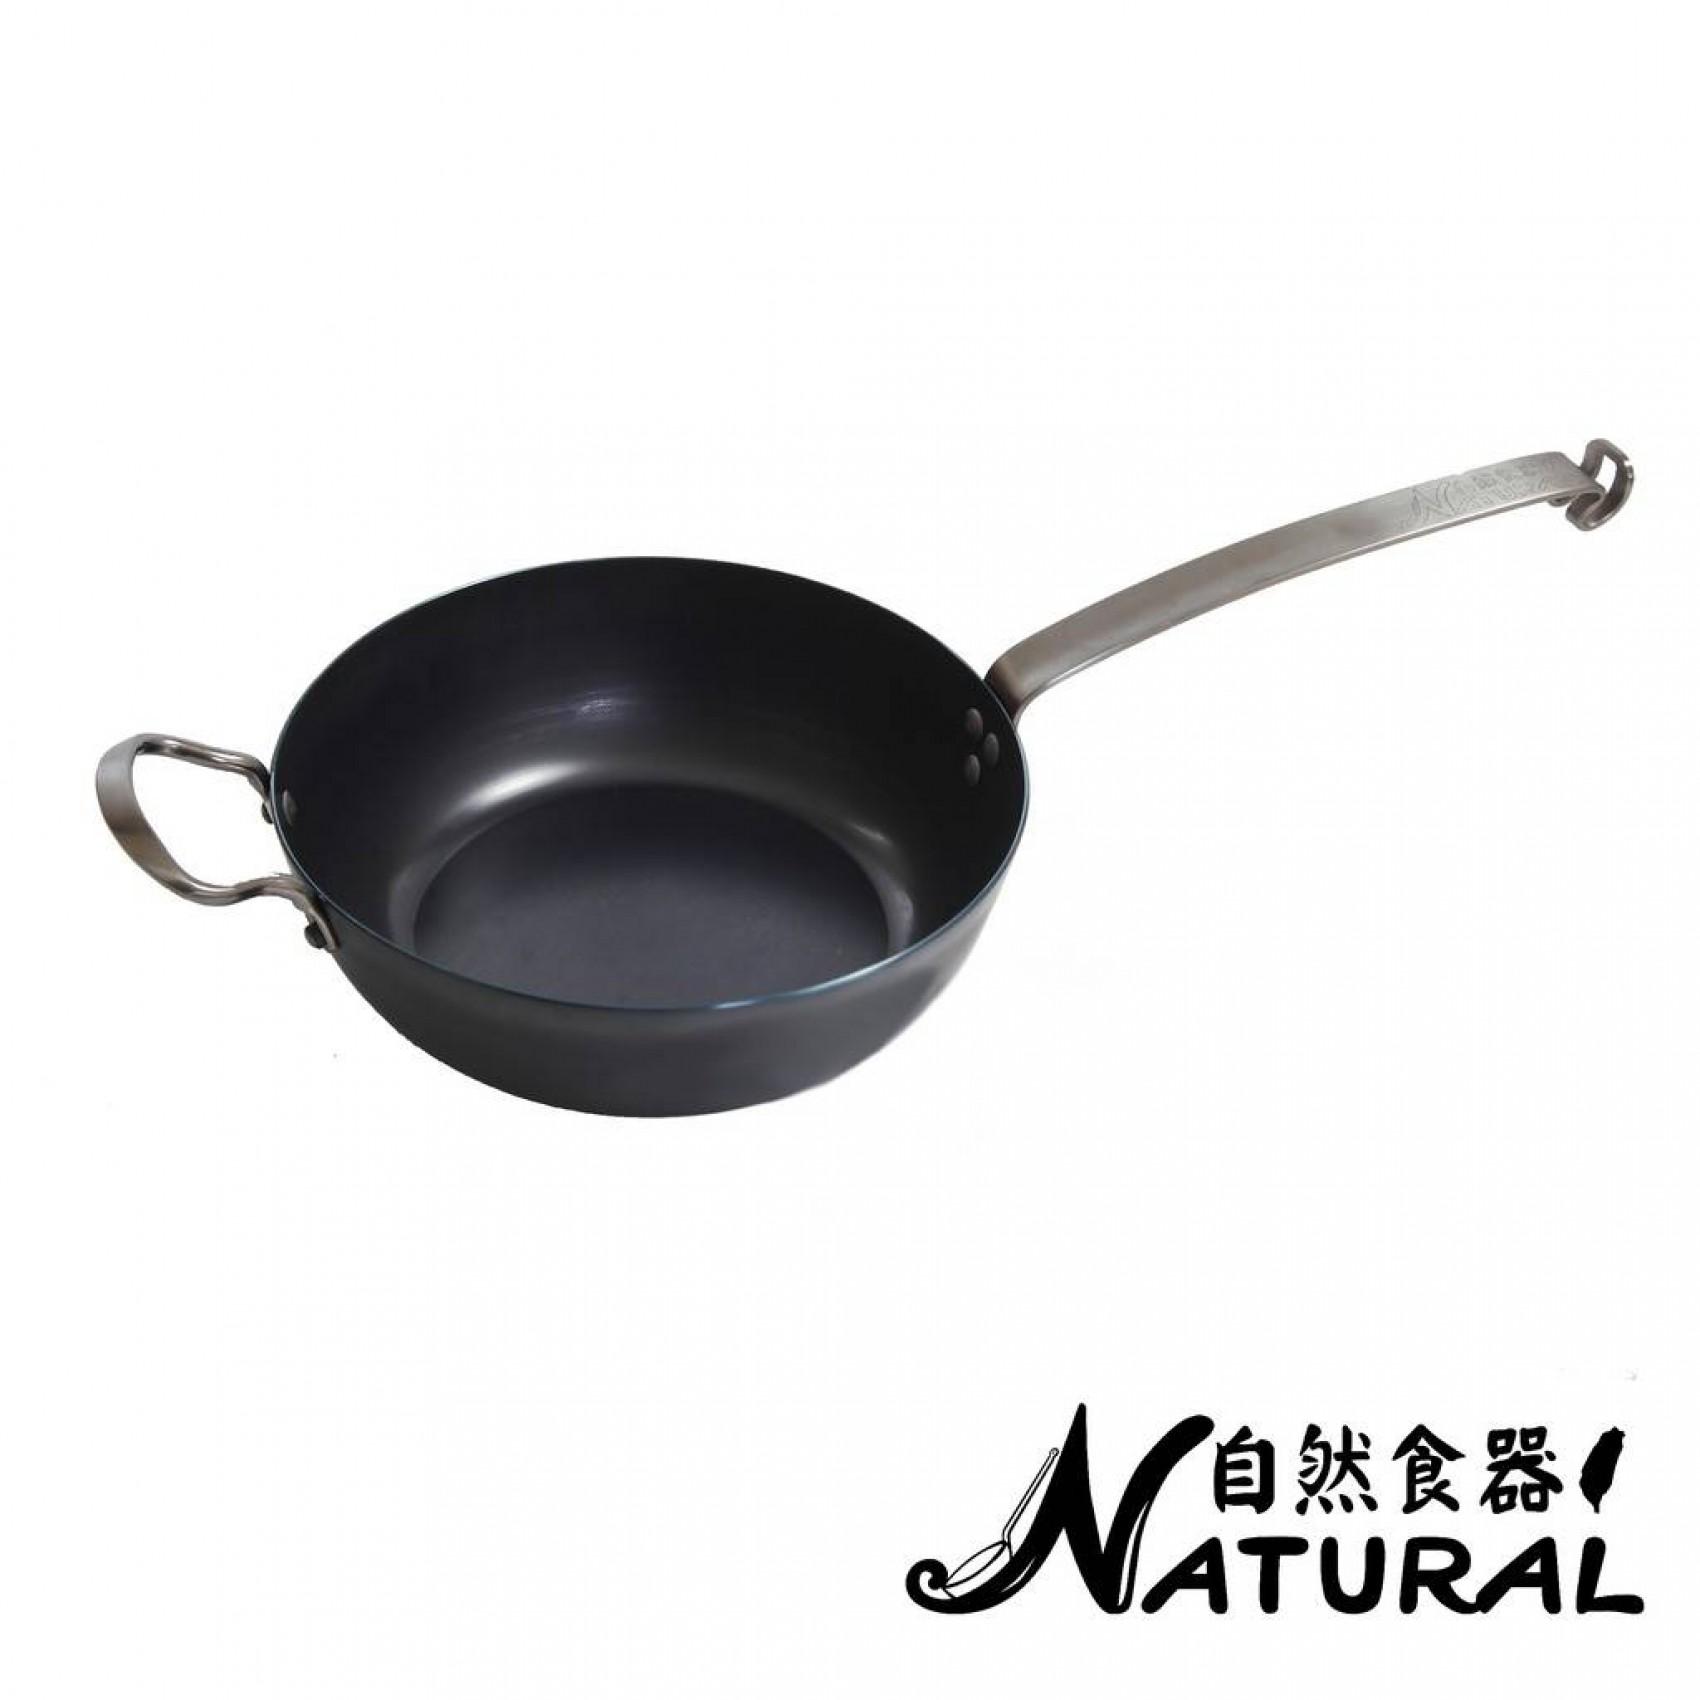 28cm深炒鍋(饕鐵鍋),無毒、養生、健康三者一手打造的純鐵不沾鍋